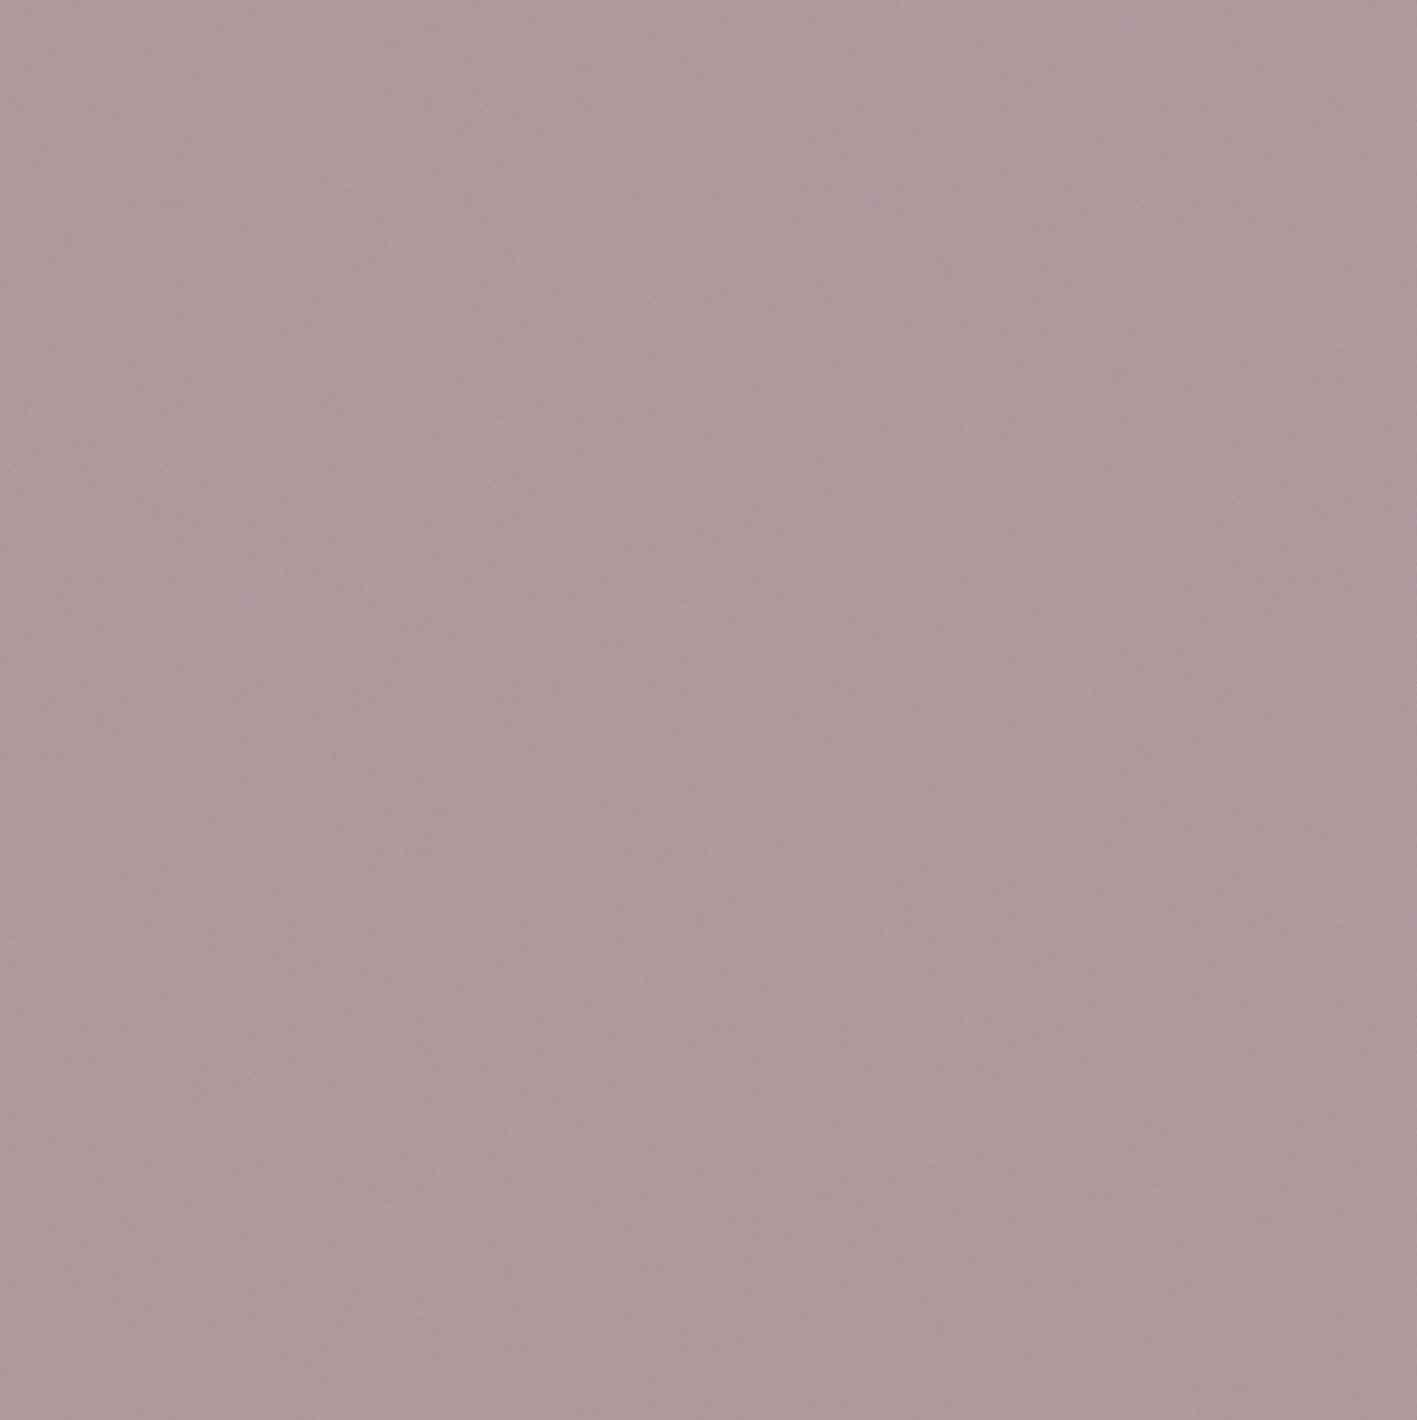 Crayons of Cerim Primrose Matte 6mm 120 x 120